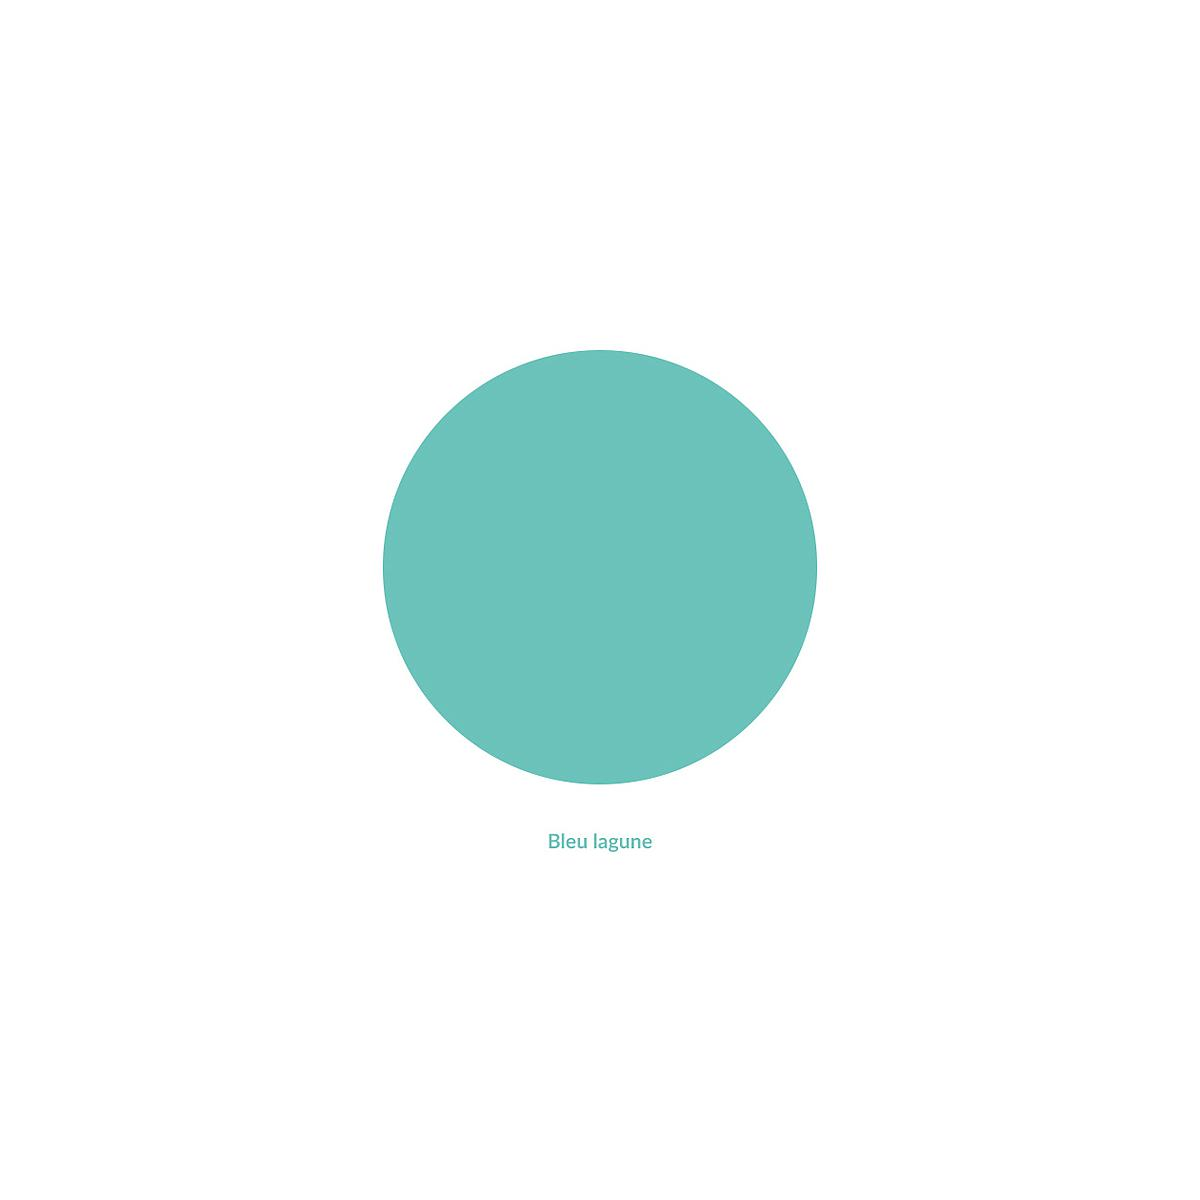 BISTRO by Fermob Chaise pliante bleu lagune